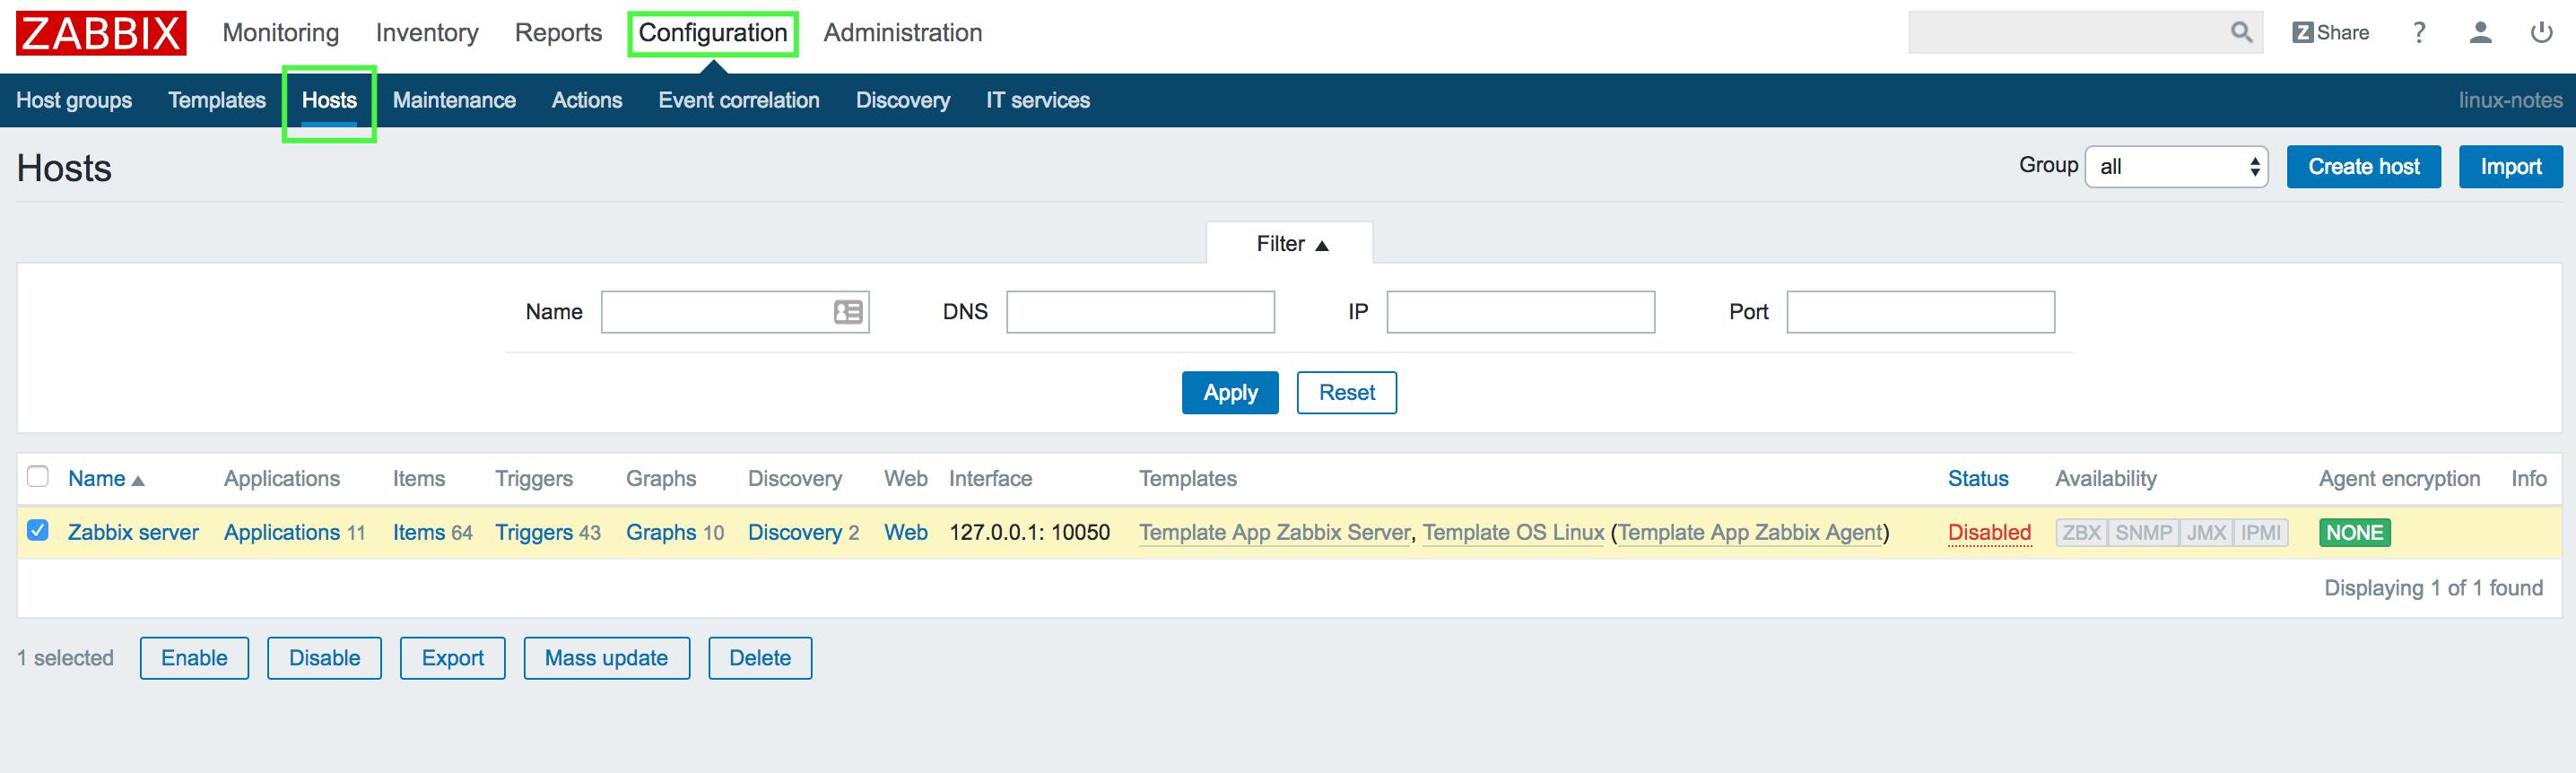 Включаем мониторинг Zabbix сервера